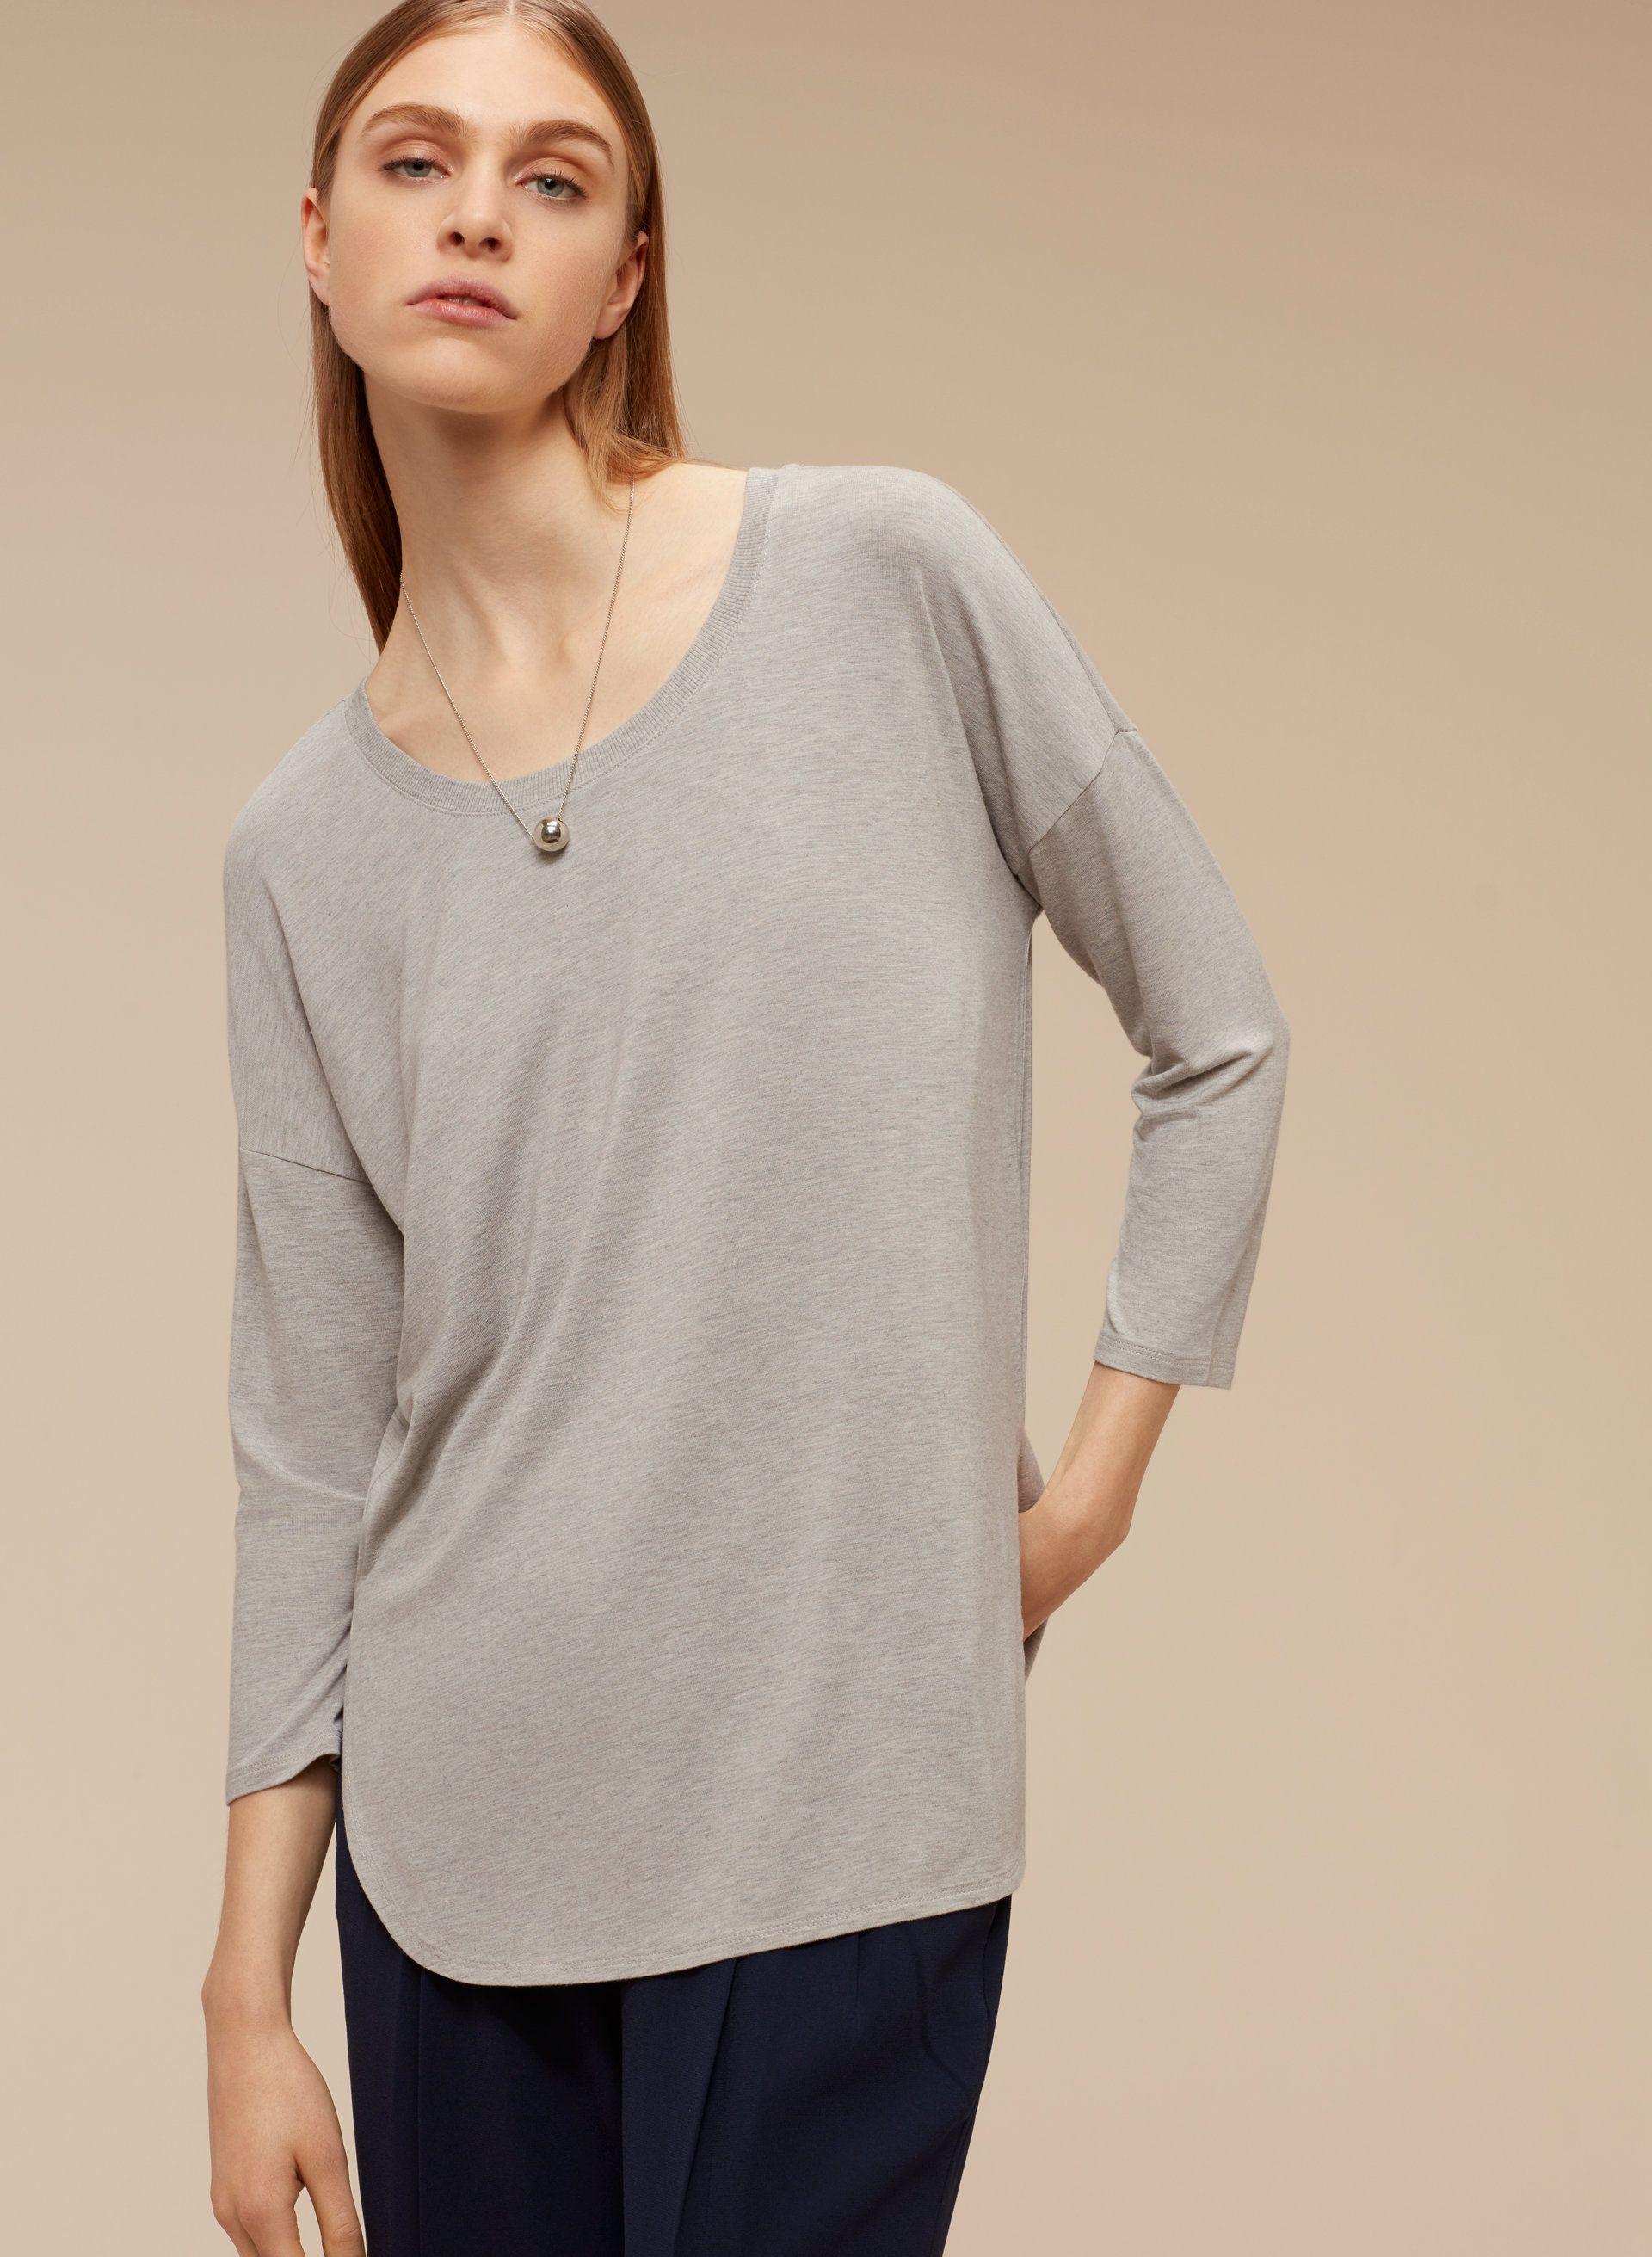 df8f977237b22f Norris t-shirt | Clothes & Accessories :) | Shirts, T shirt, Long ...